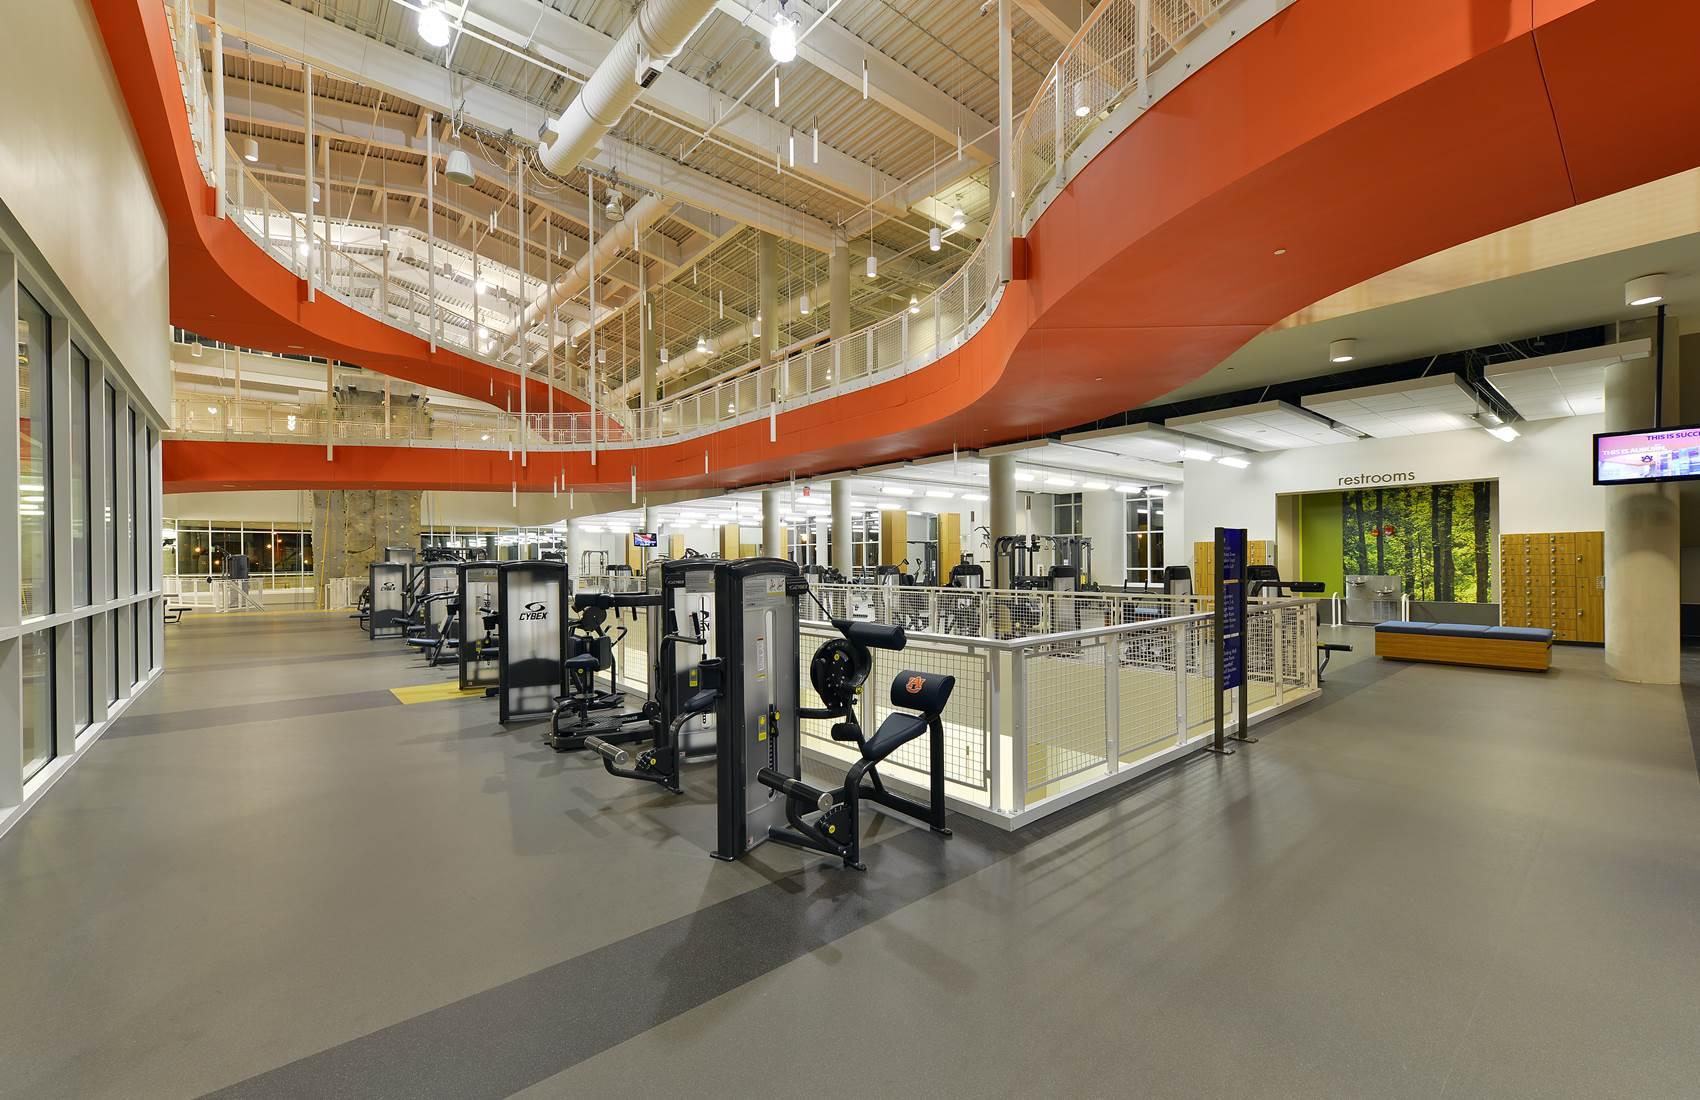 Auburn University Recreation and Wellness Center